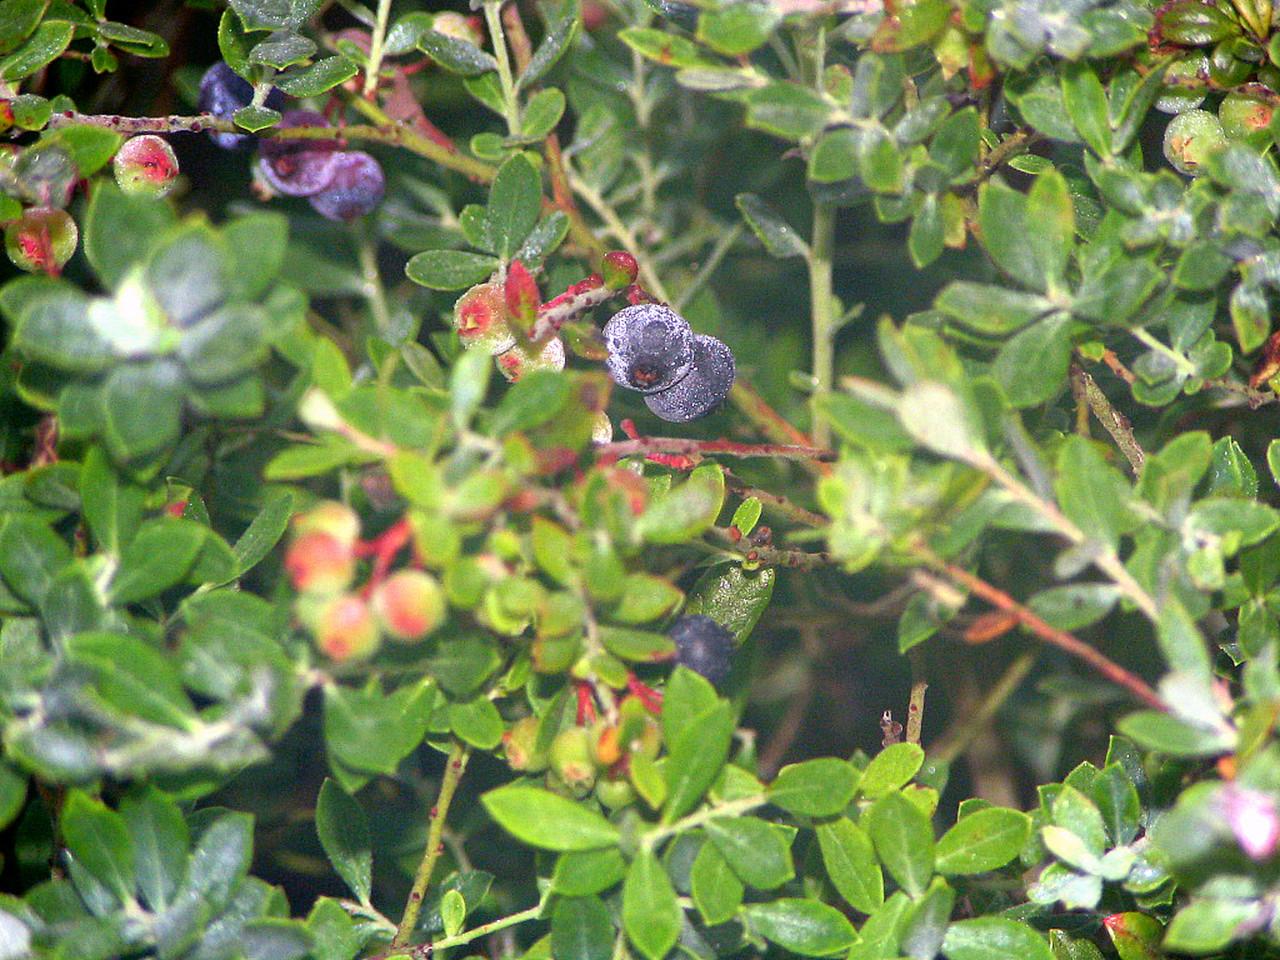 Fresh blueberries<br /> photo credit: Janette Davison / Florida Trail Association